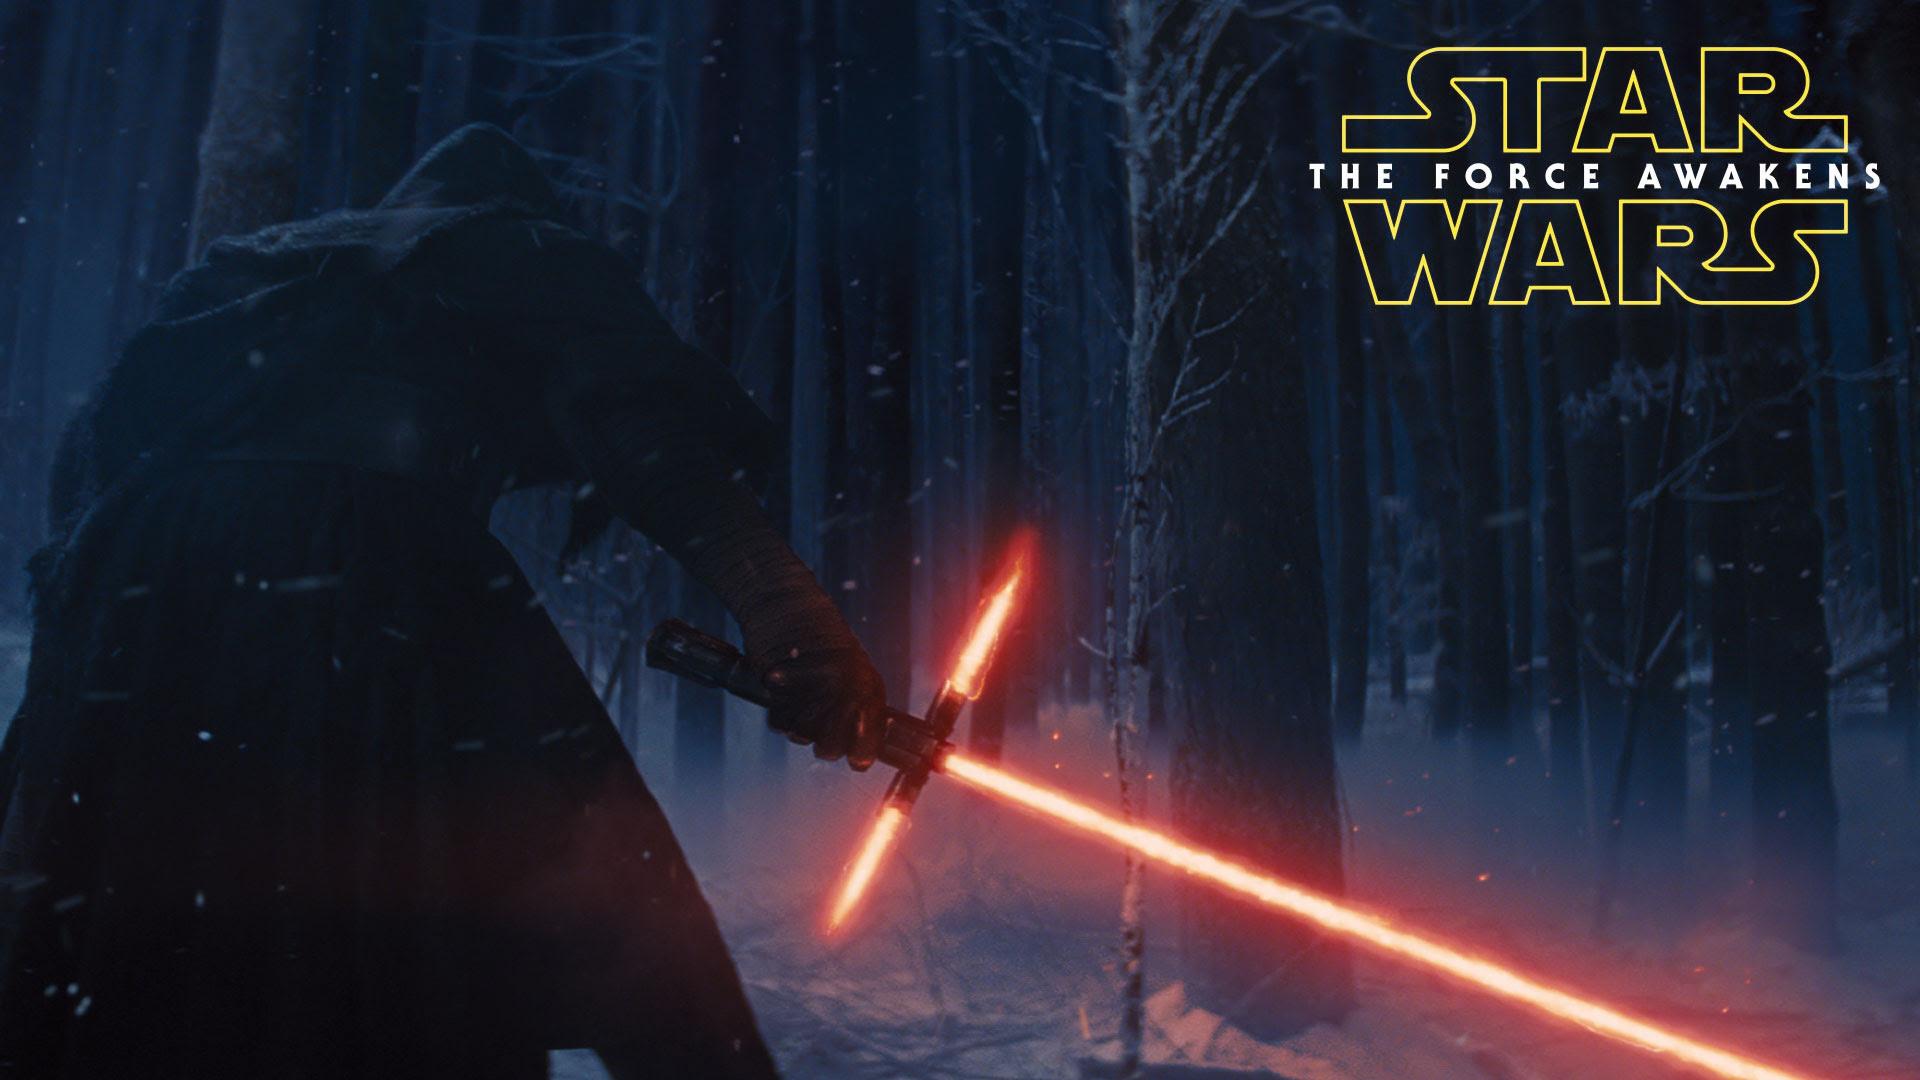 Star Wars The Force Awakens Star Wars Wallpaper 39209176 Fanpop